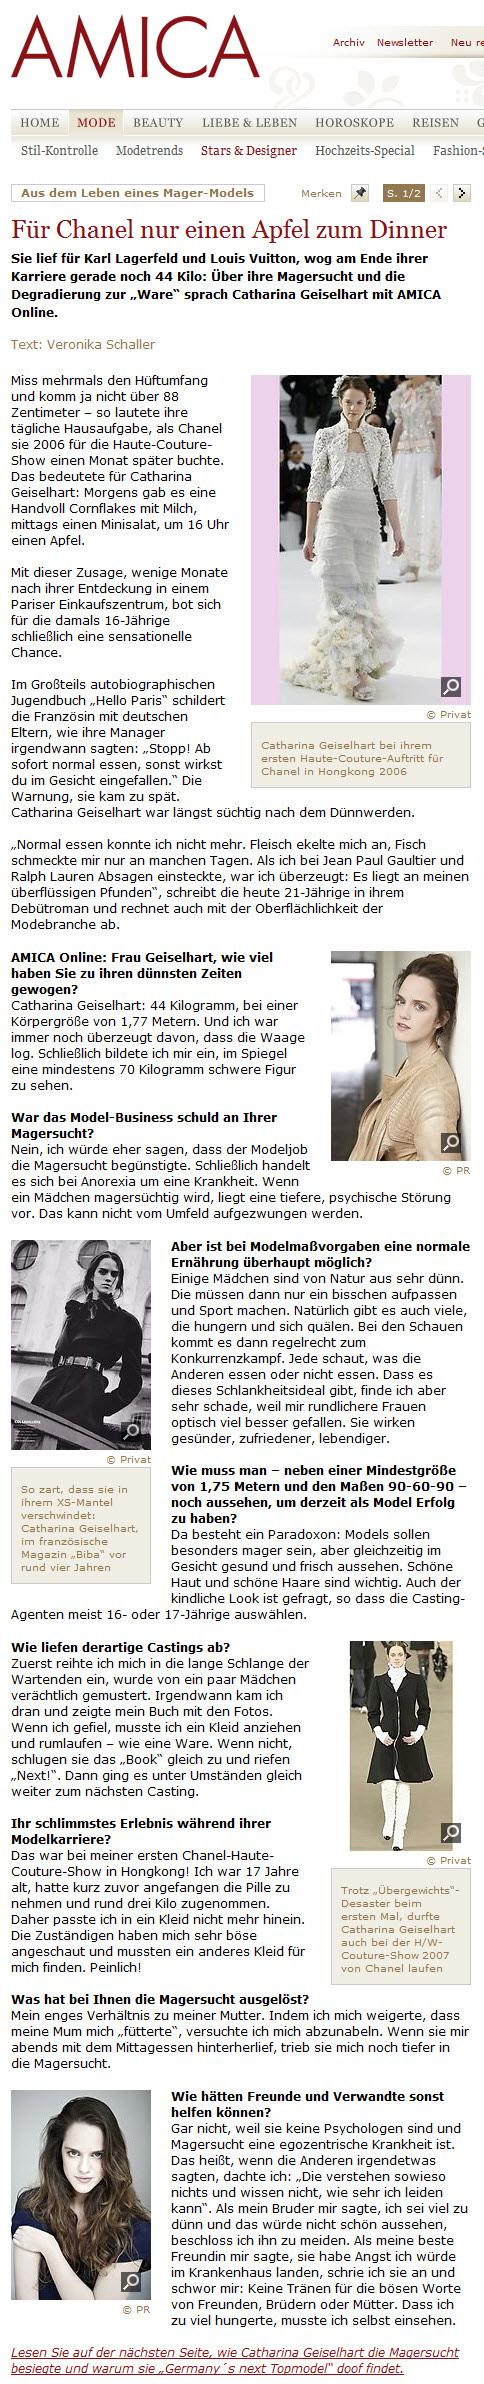 Amica Interview Teil 1